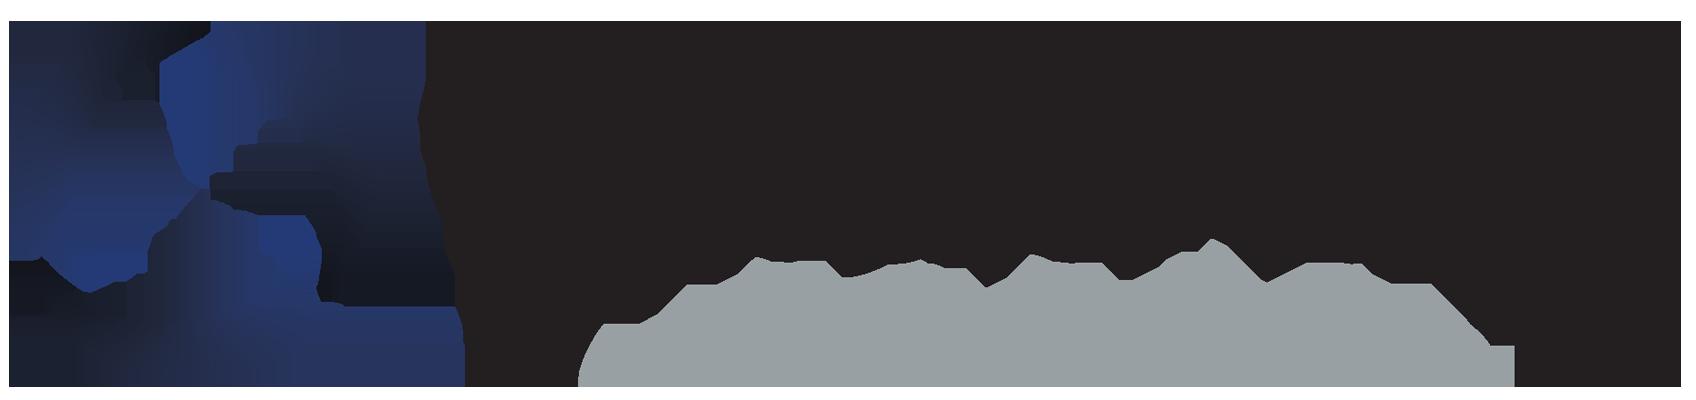 Origin Law Group Logo